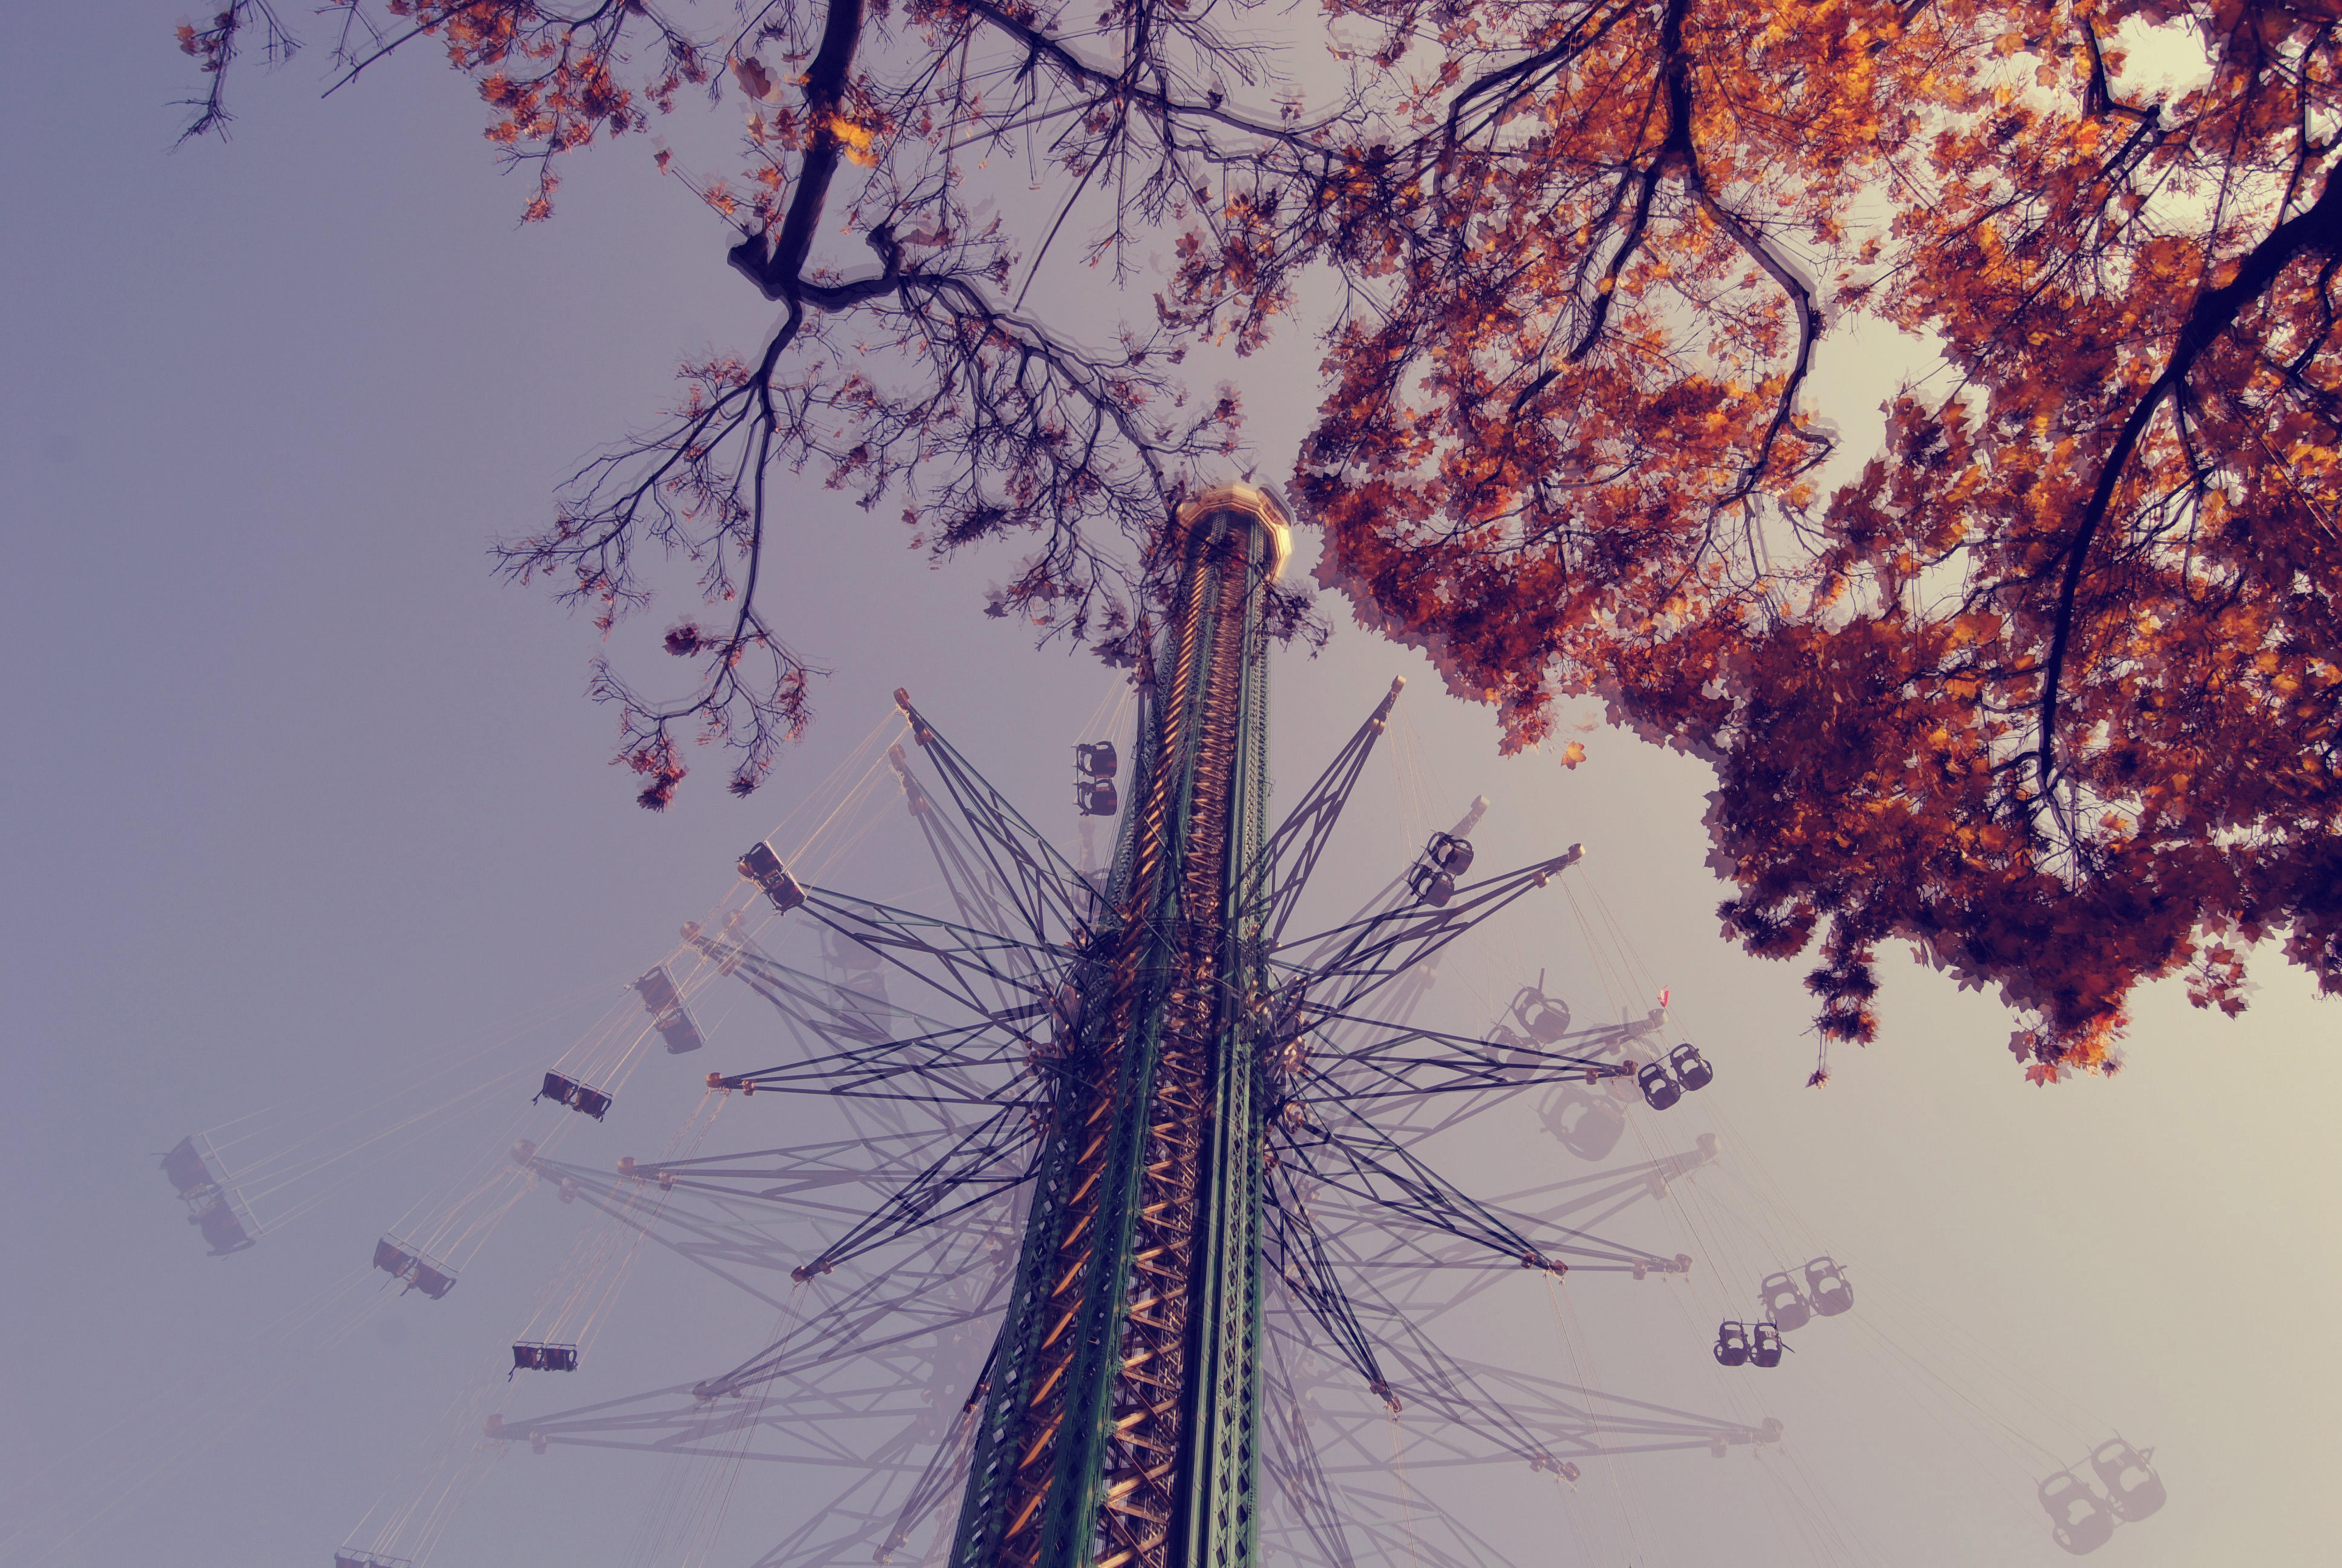 rides flying